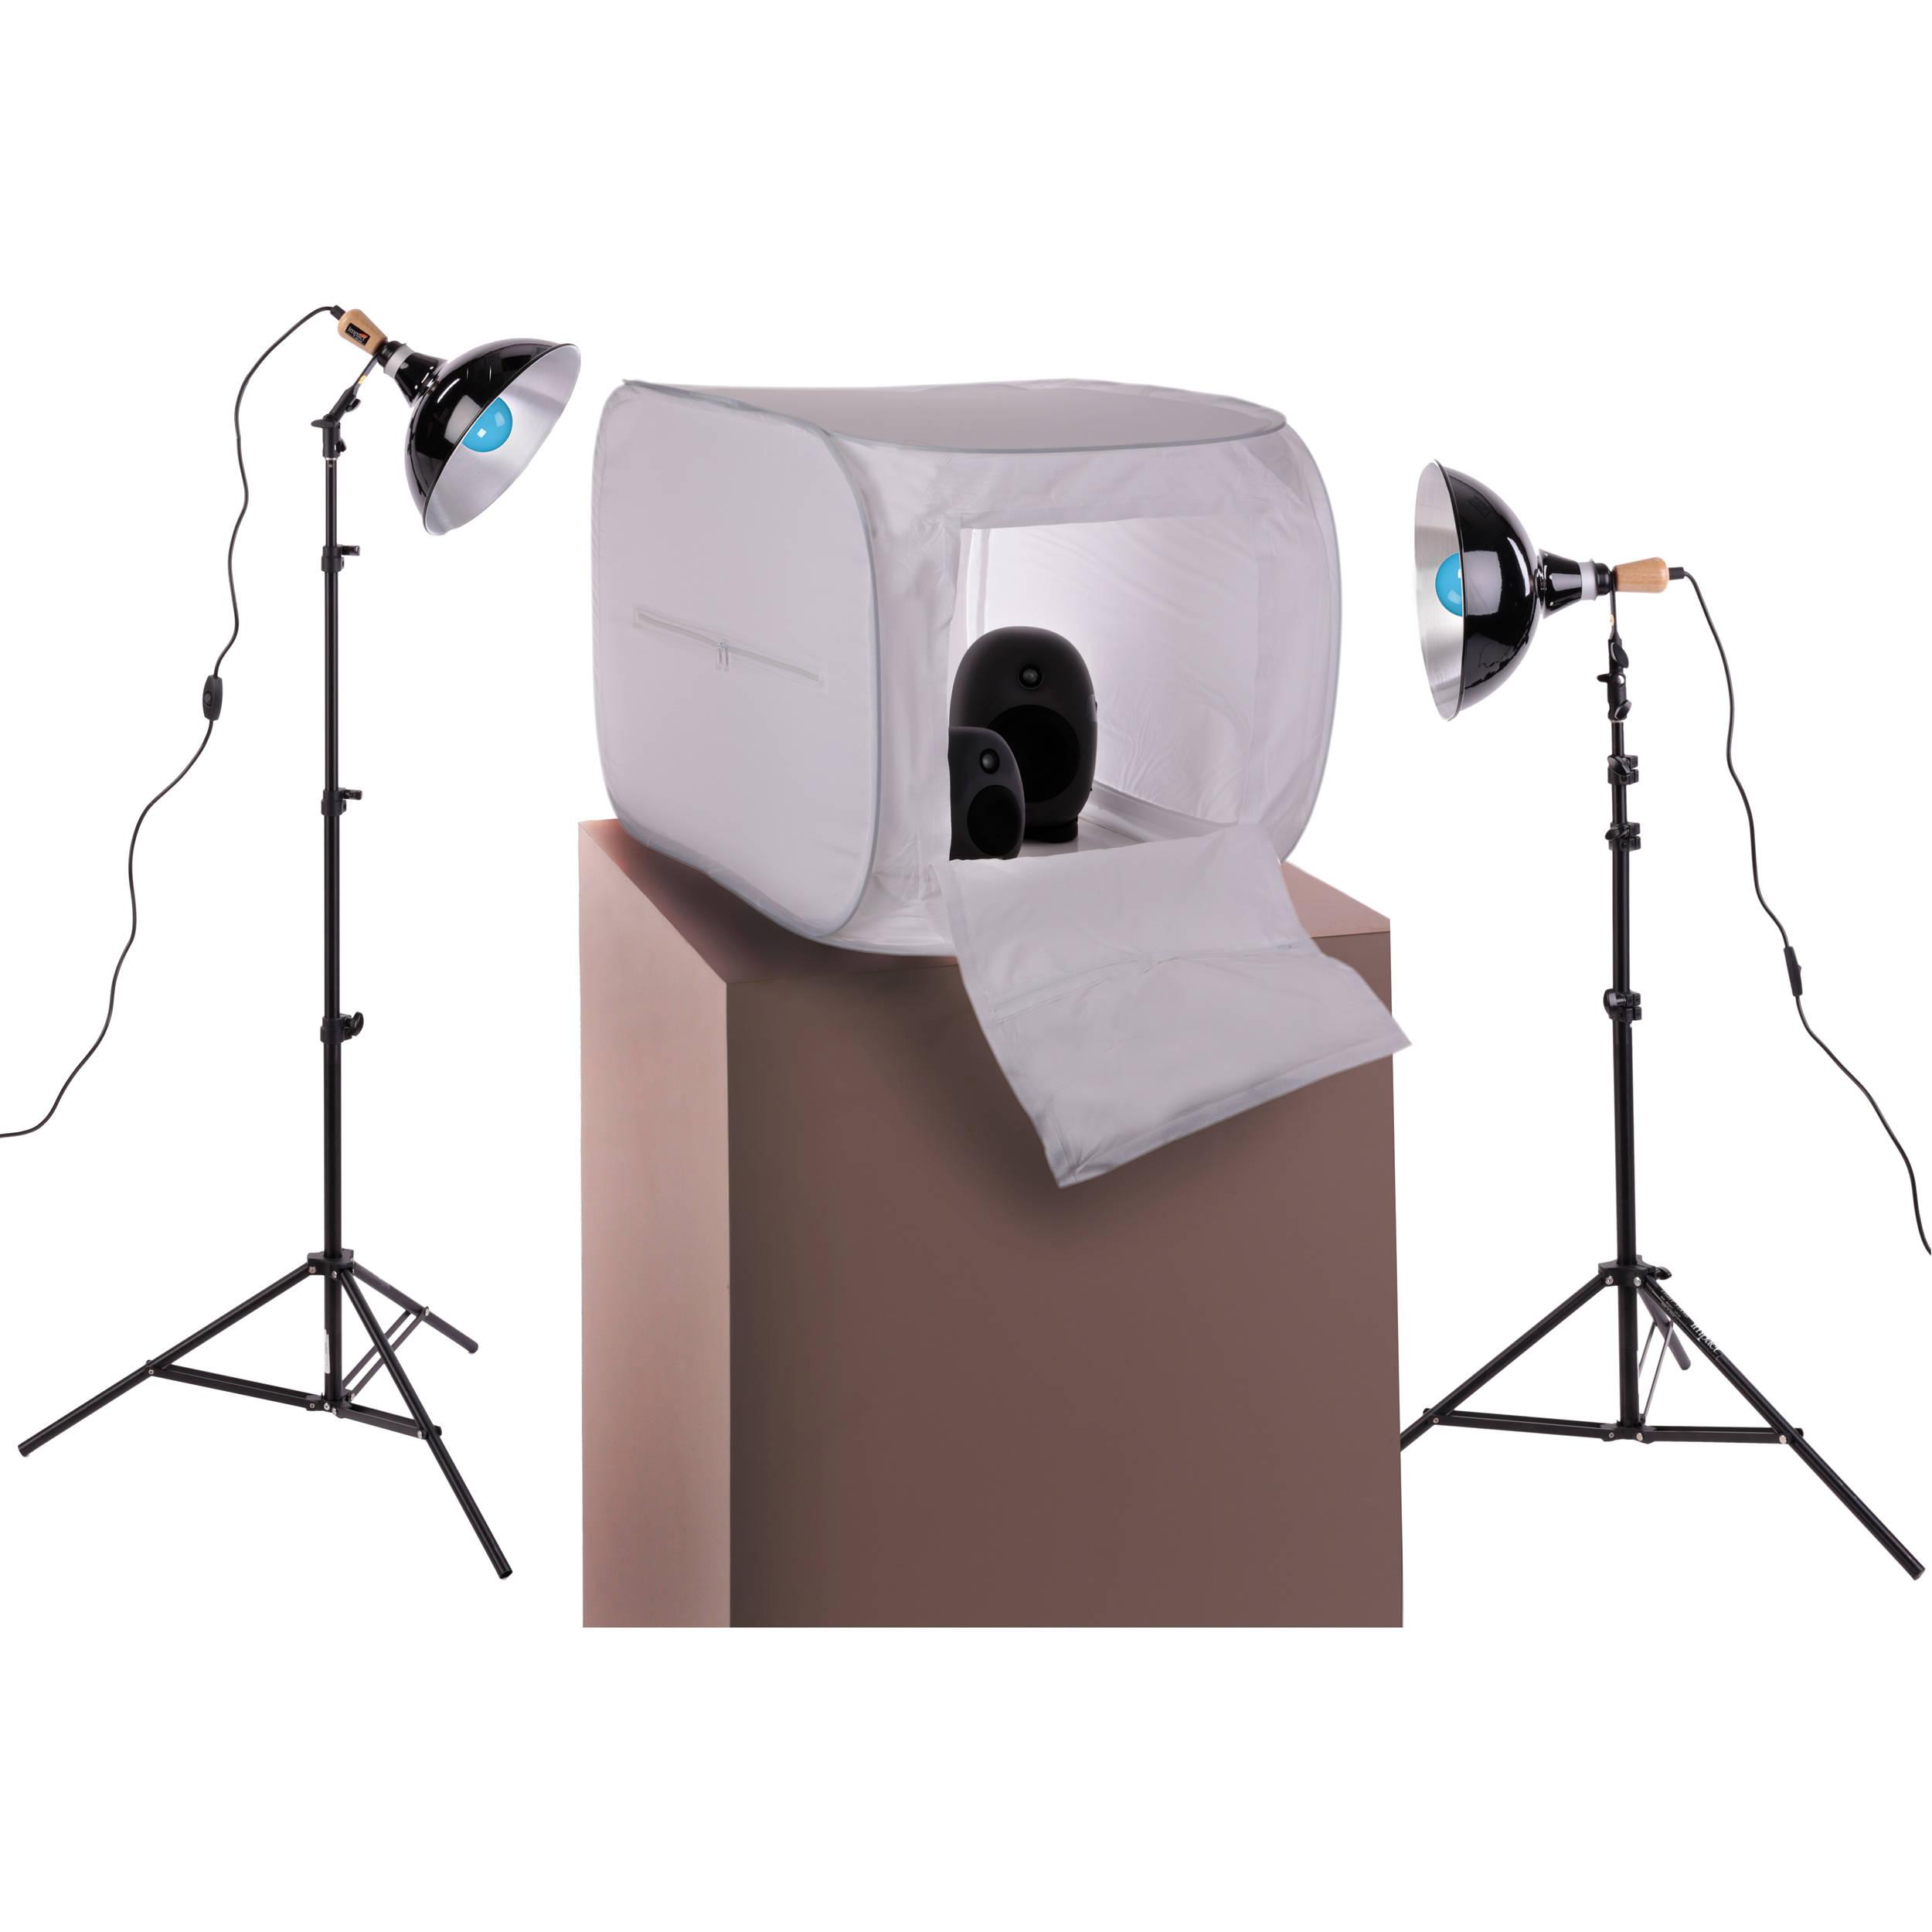 Impact Two-Light Digital Light Shed Kit - 24 x 24   sc 1 st  Bu0026H & Shooting Tents u0026 Table Light Kits | Bu0026H Photo Video